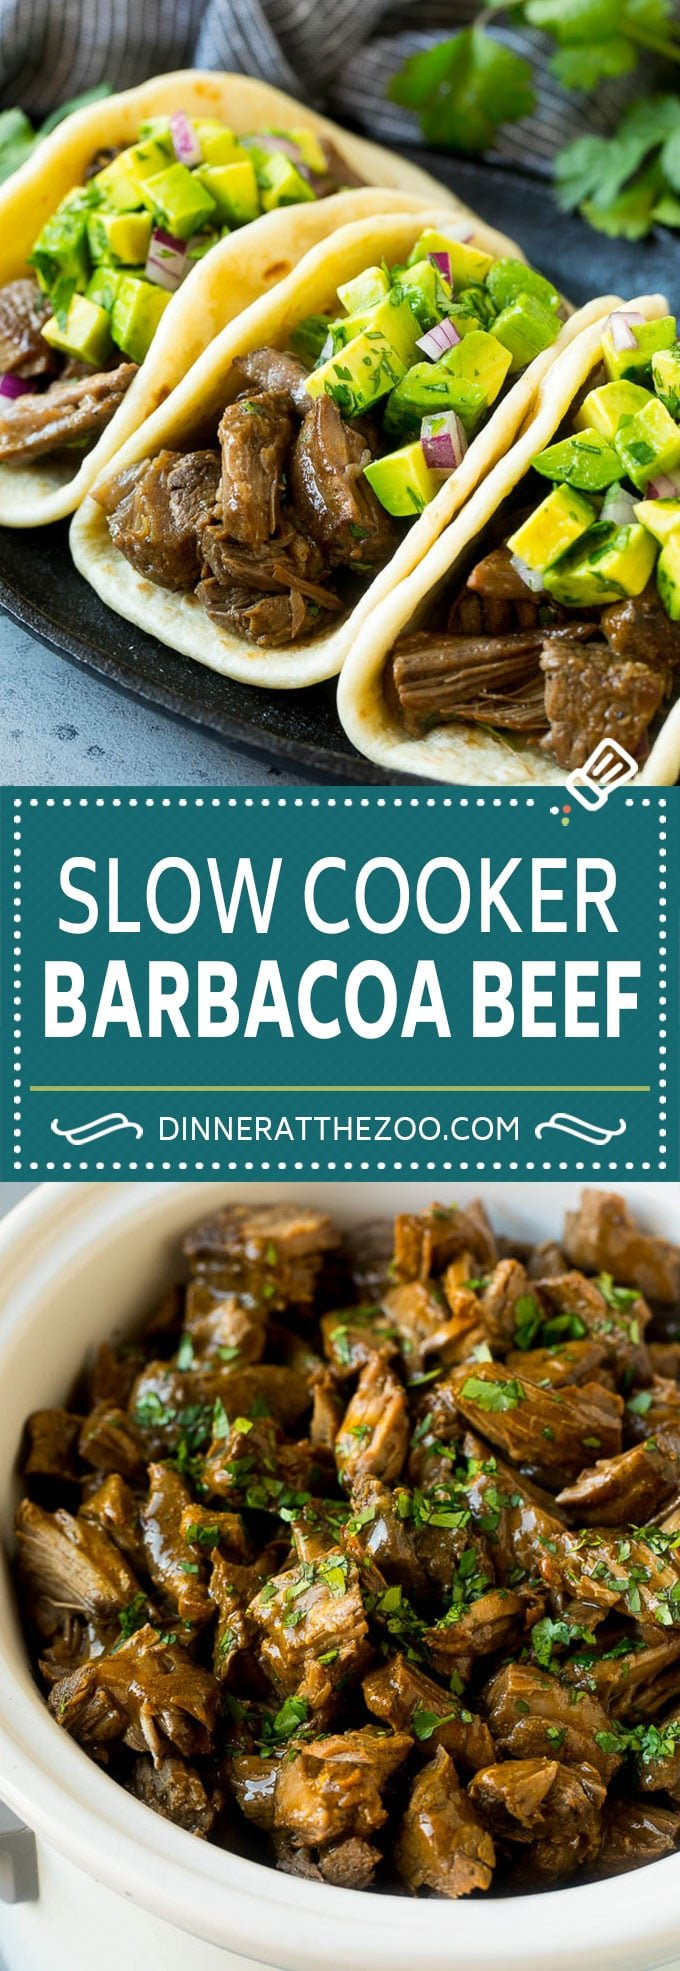 Slow Cooker Barbacoa | Beef Tacos | Crock Pot Beef Tacos #beef #tacos #crockpot #slowcooker #dinner #avocado #dinneratthezoo